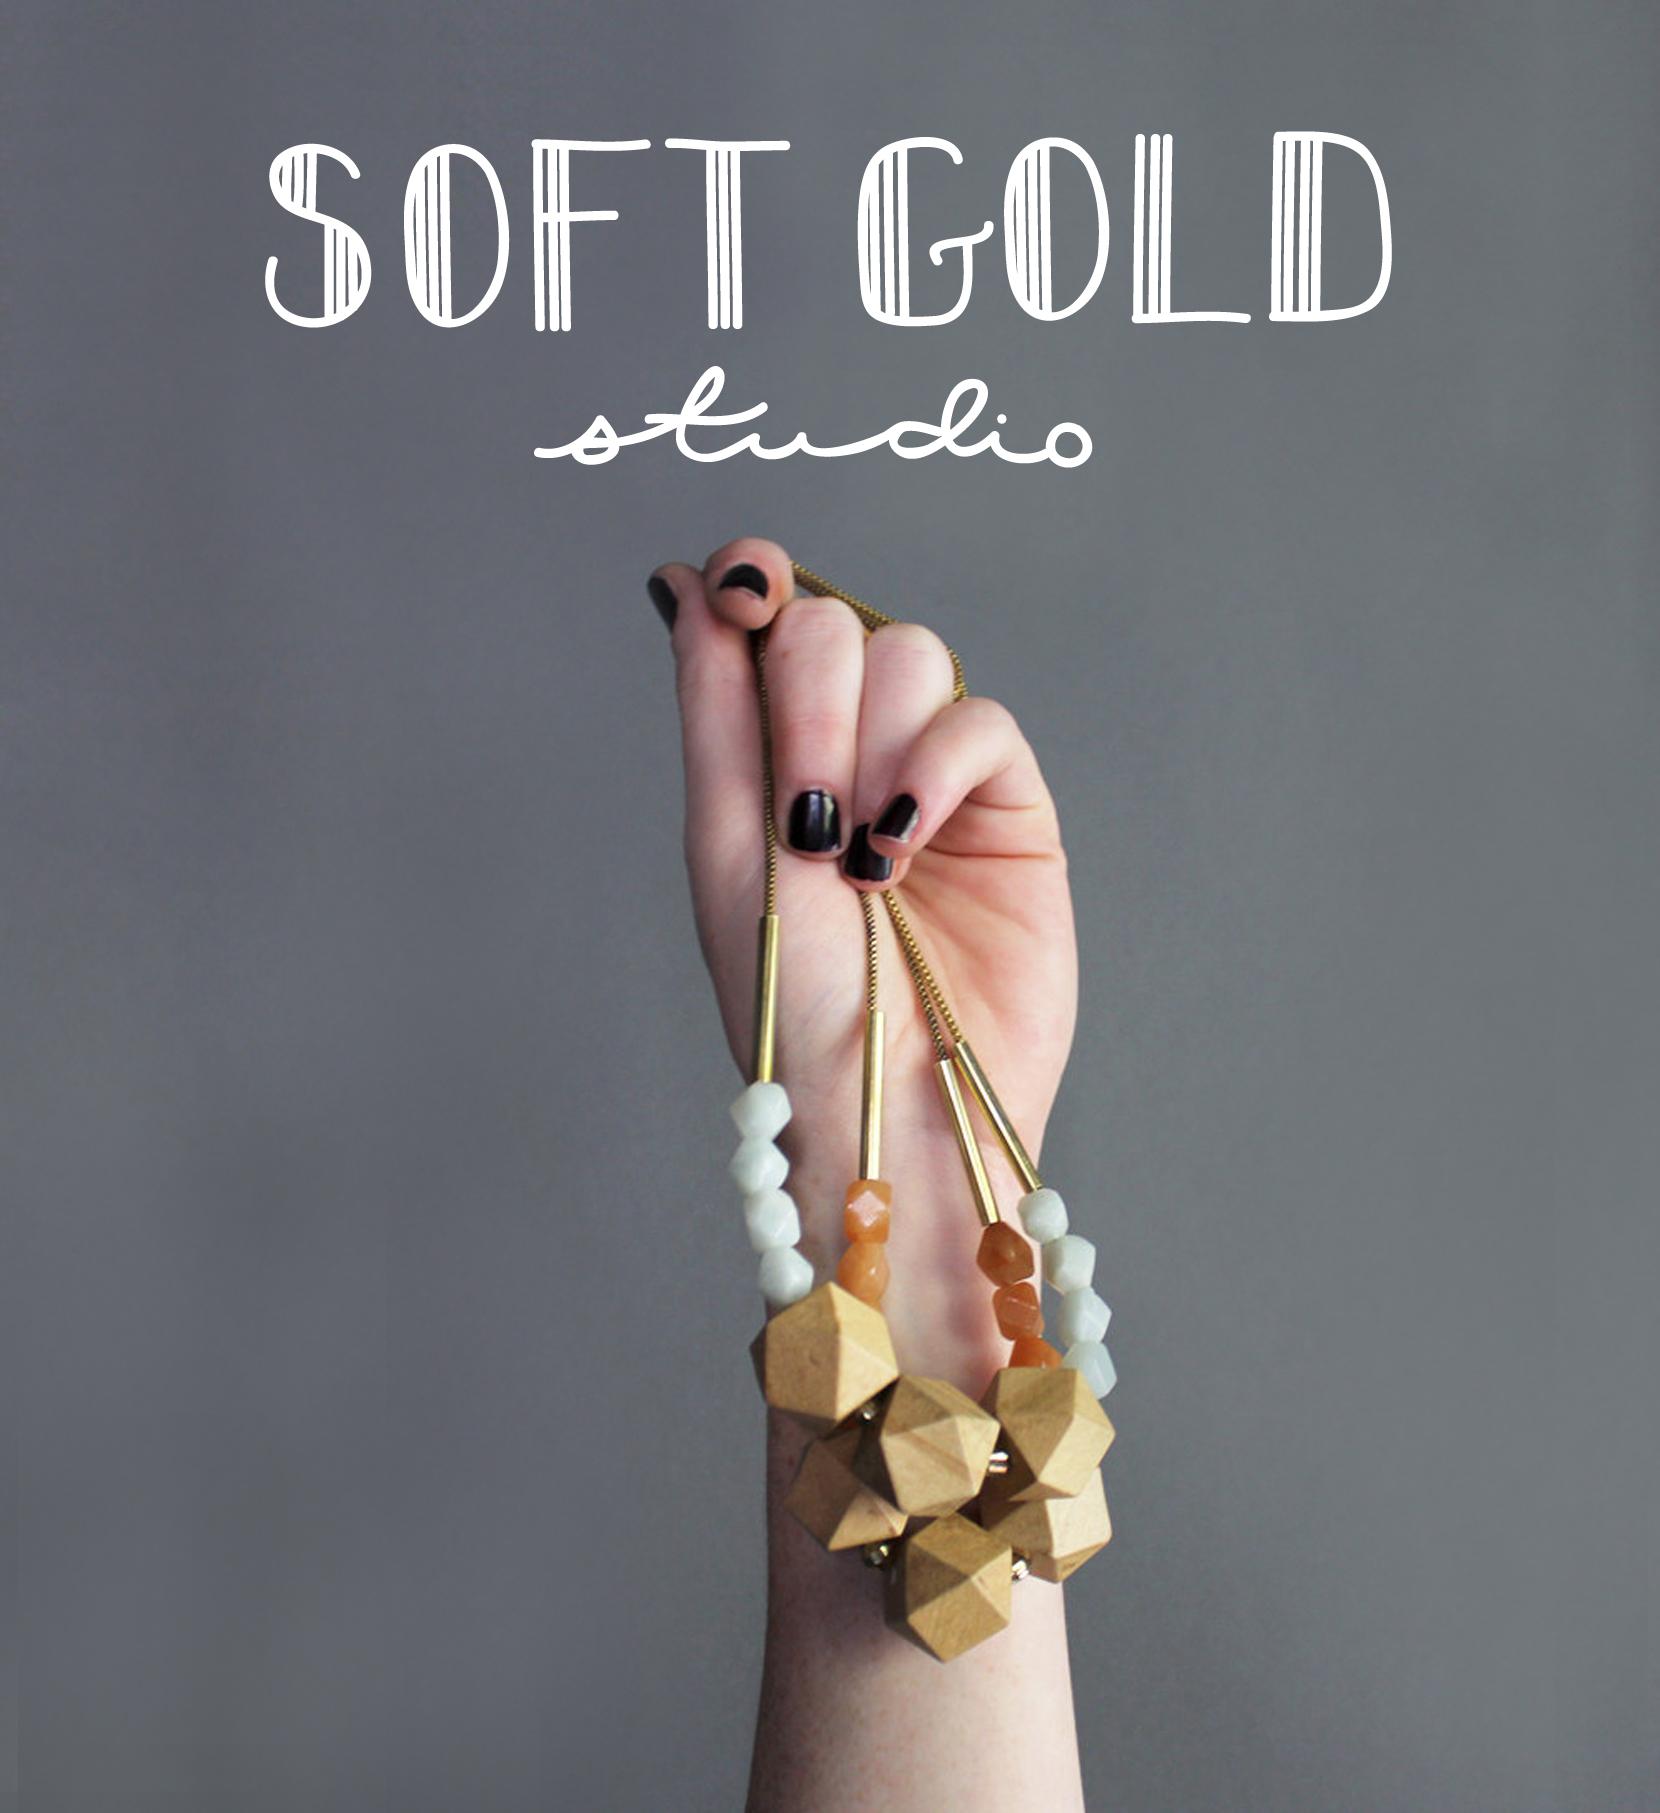 Soft Gold Studio  |  The Fresh Exchange